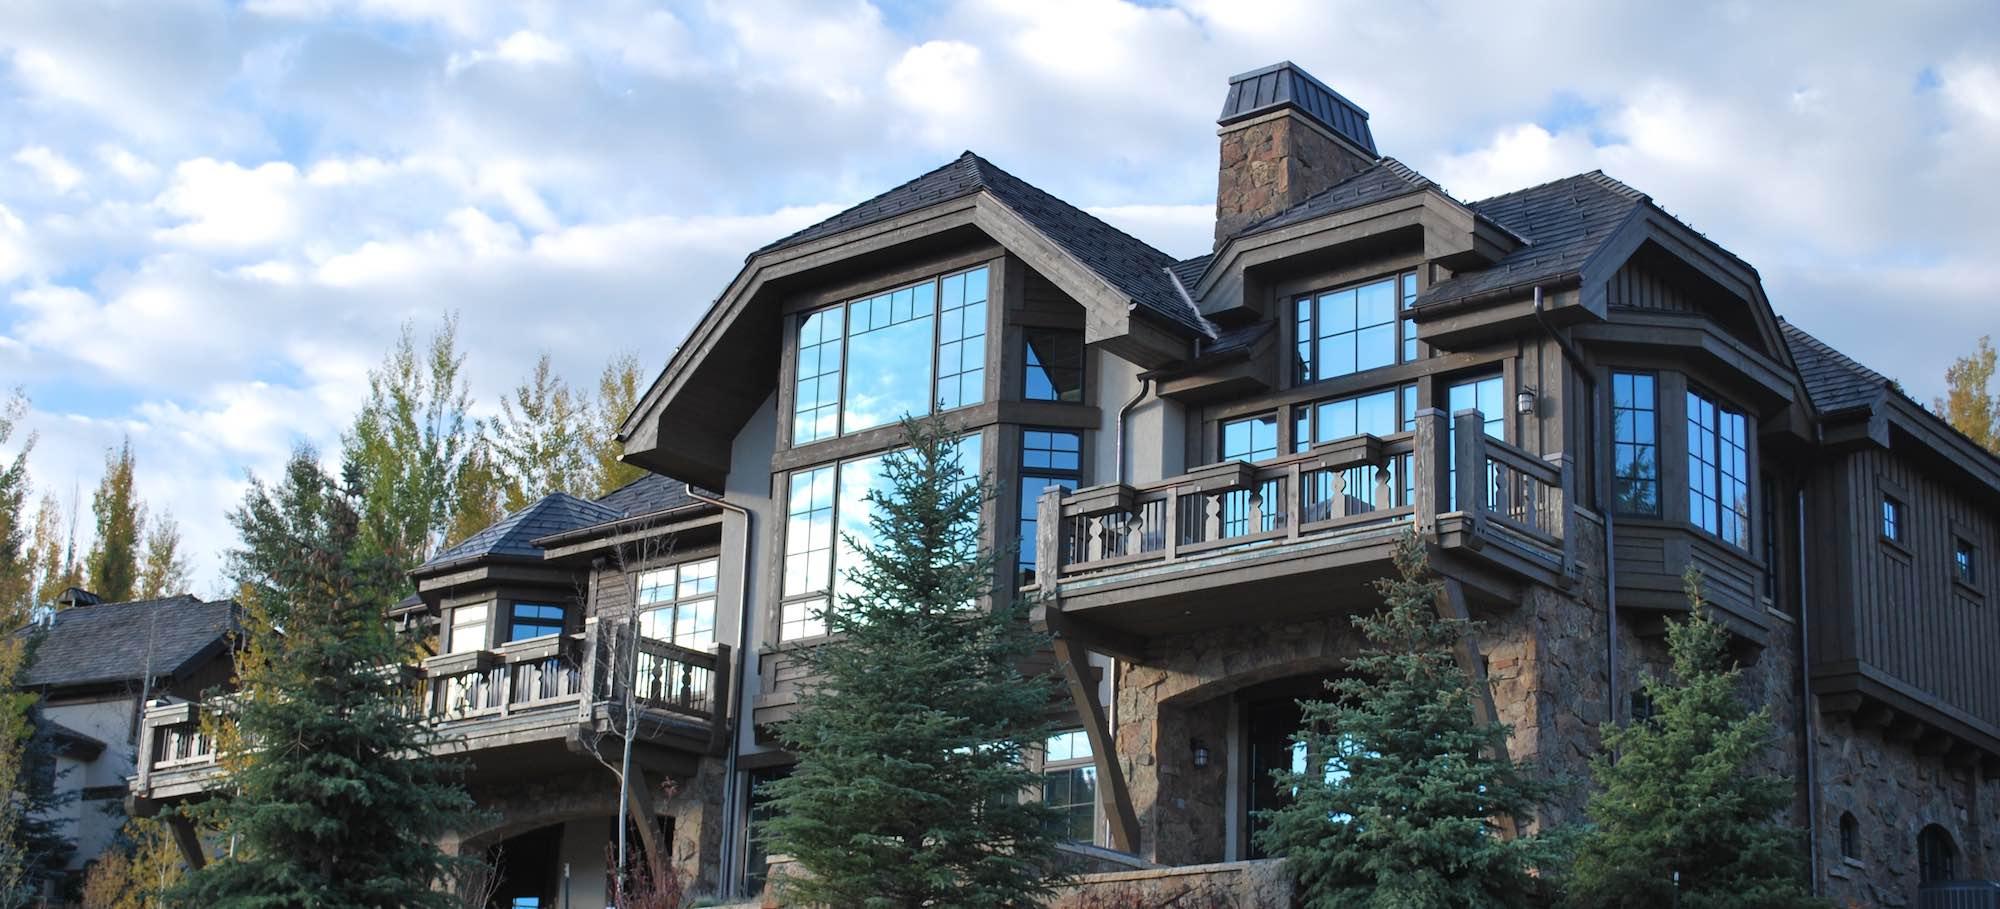 Builders' Studio - Beaver Creek House